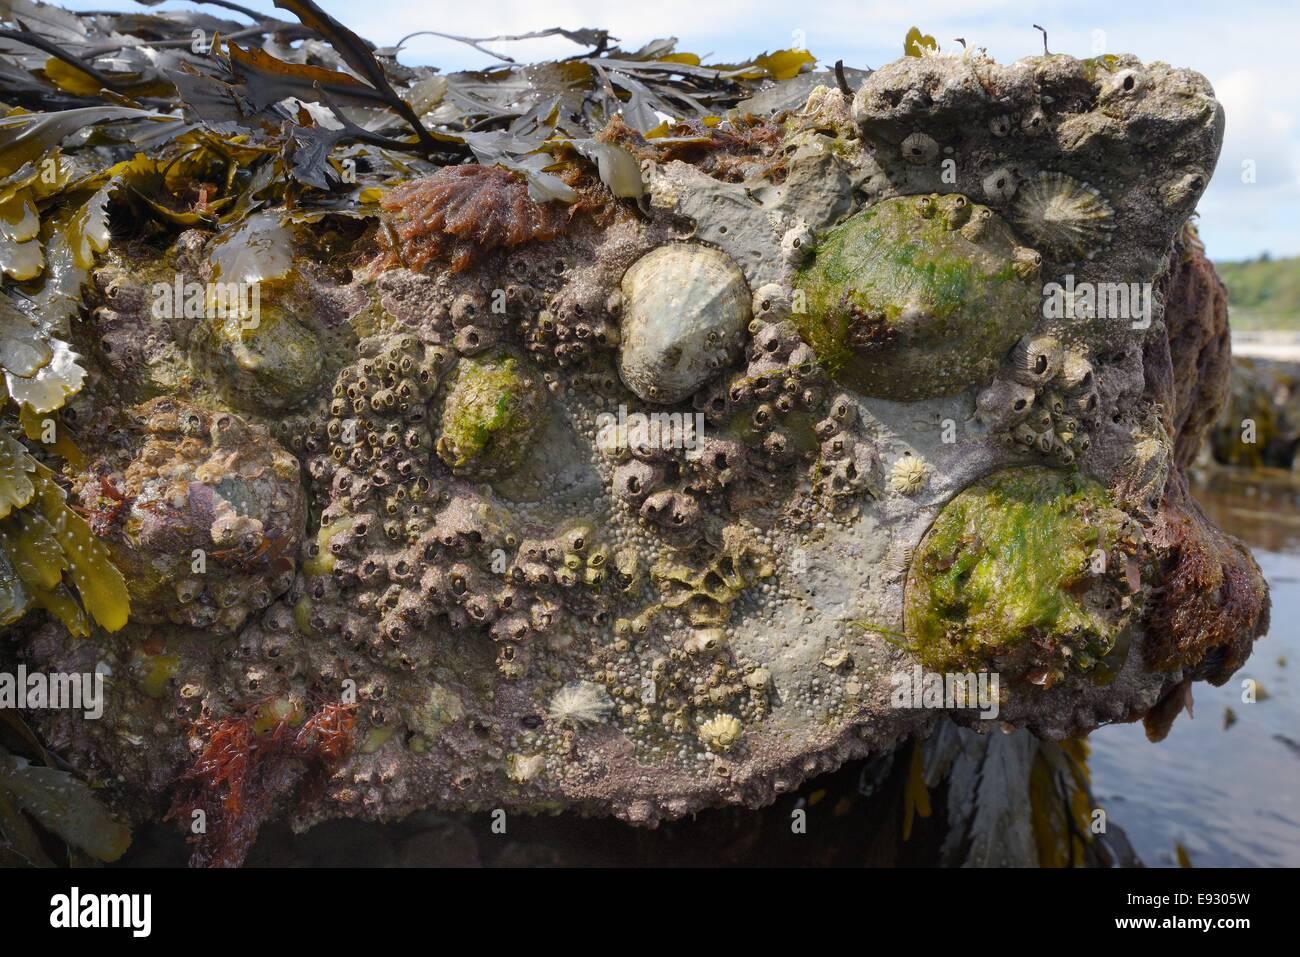 Common limpets (Patella vulgata) and Acorn barnacles (Balanus perforatus) attached to rocks exposed at low tide, Lyme Regis. Stock Photo